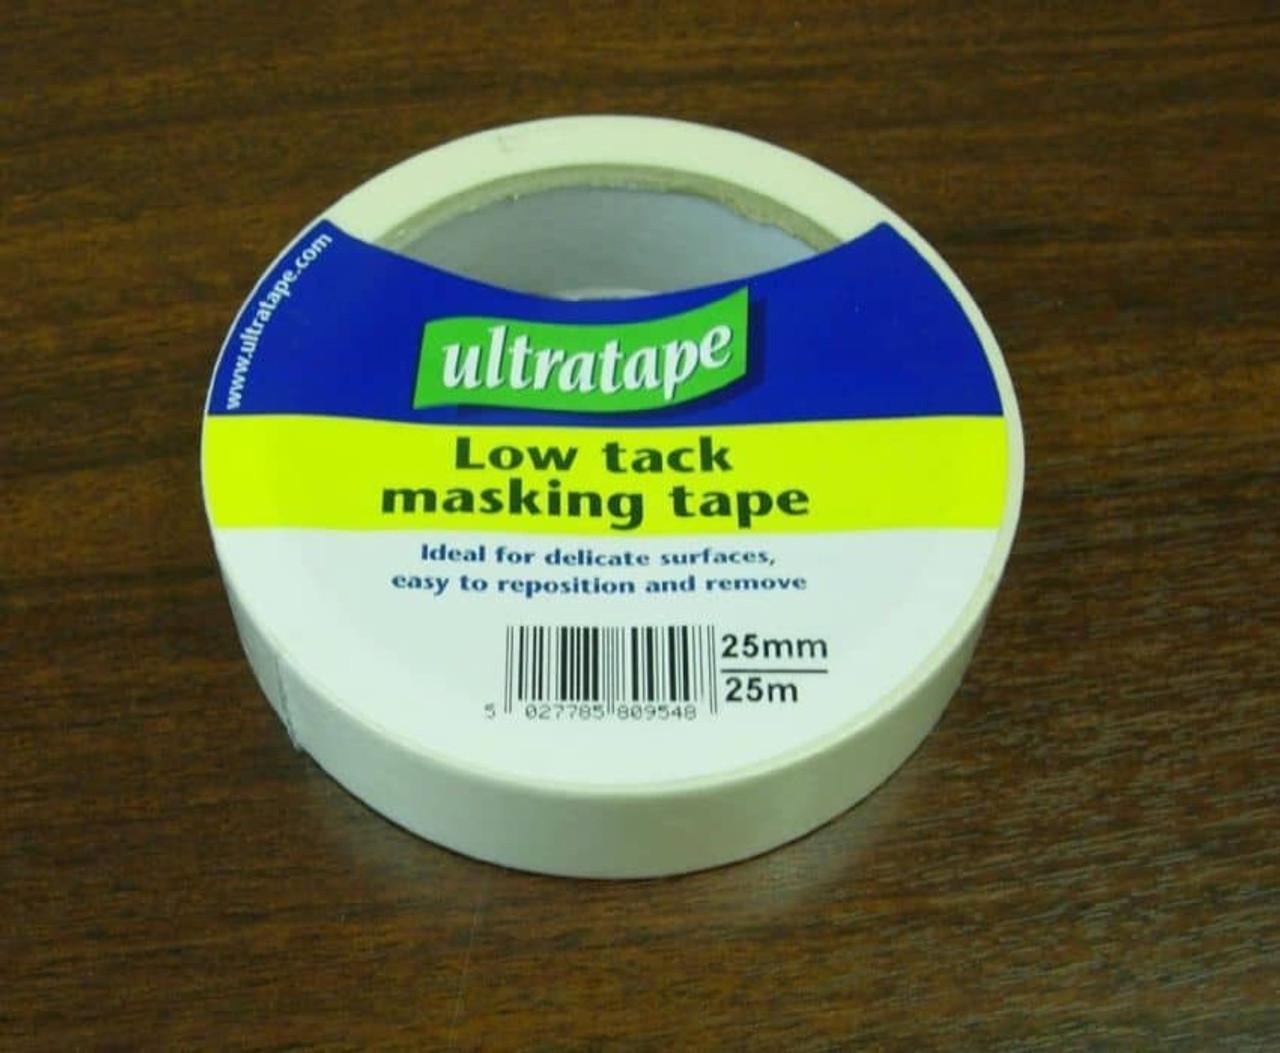 UltraTape 25mm x 25m Low Tack Masking Tape